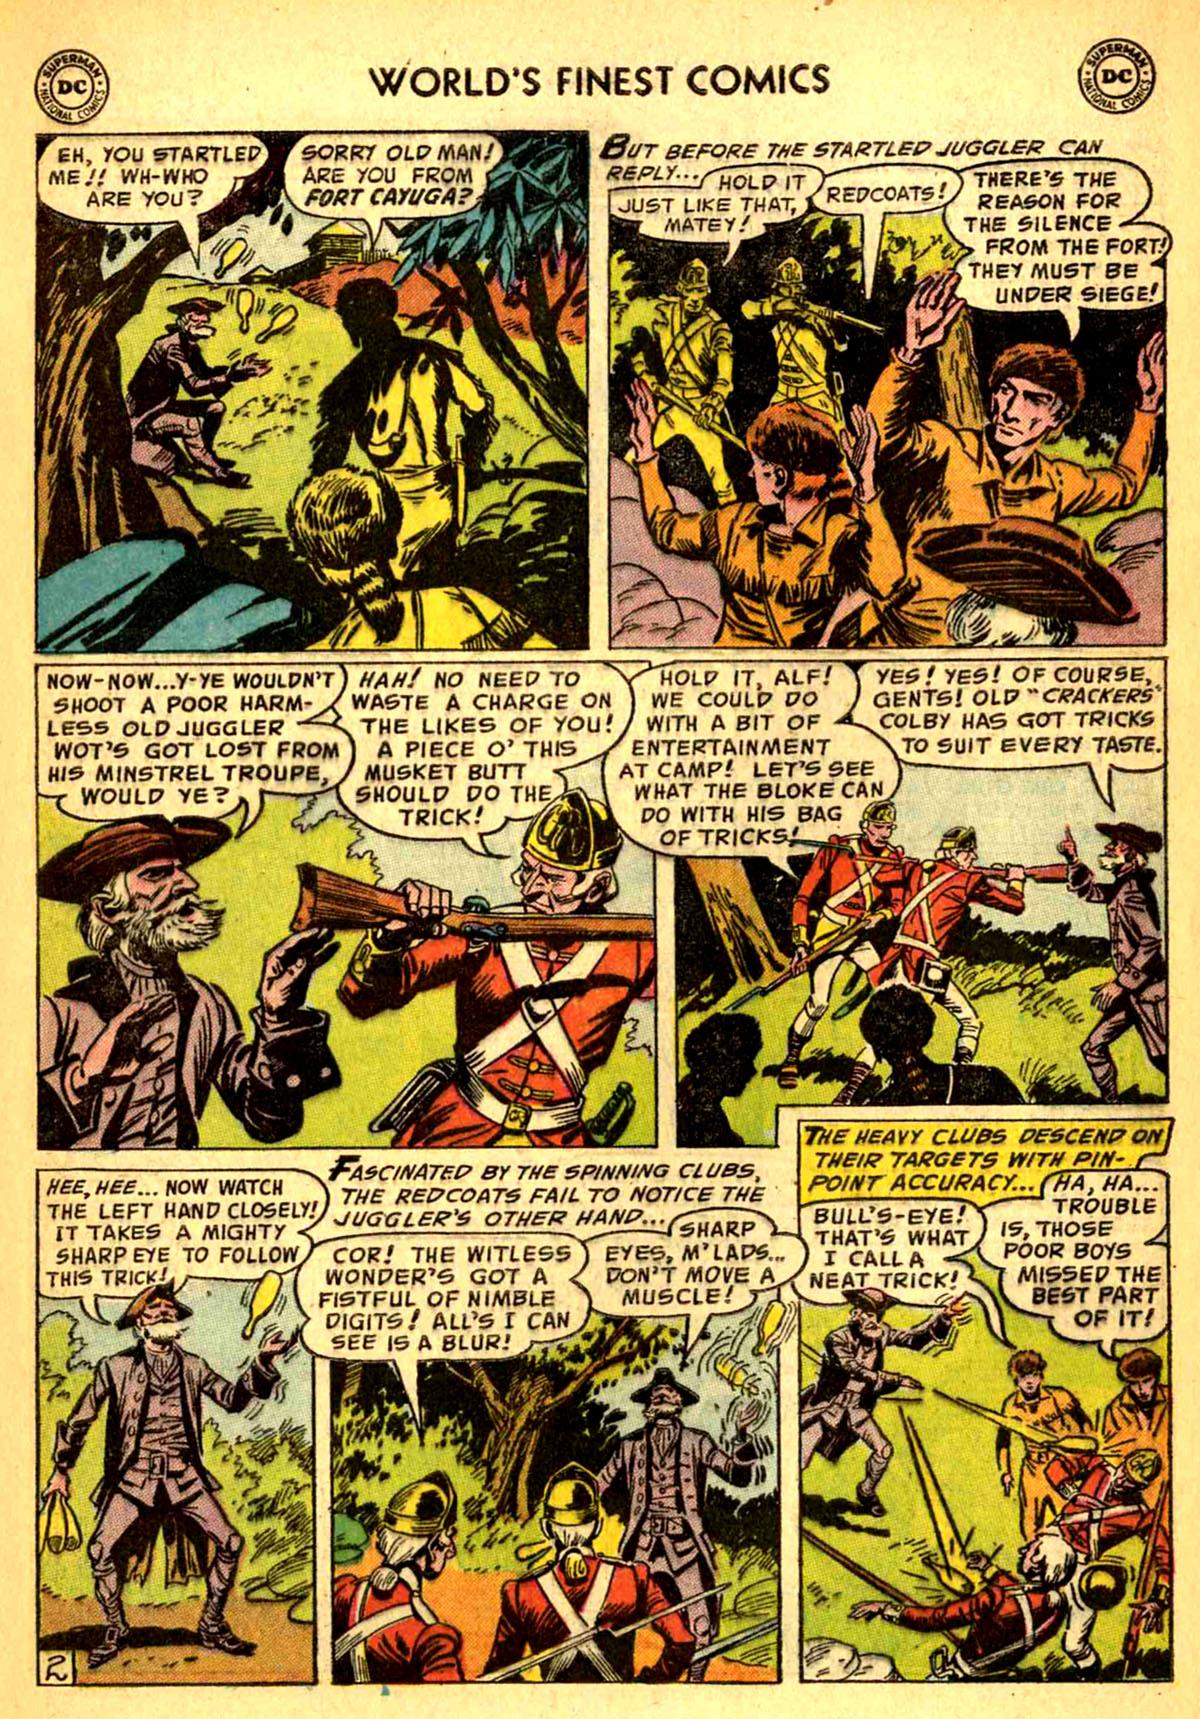 Read online World's Finest Comics comic -  Issue #77 - 29